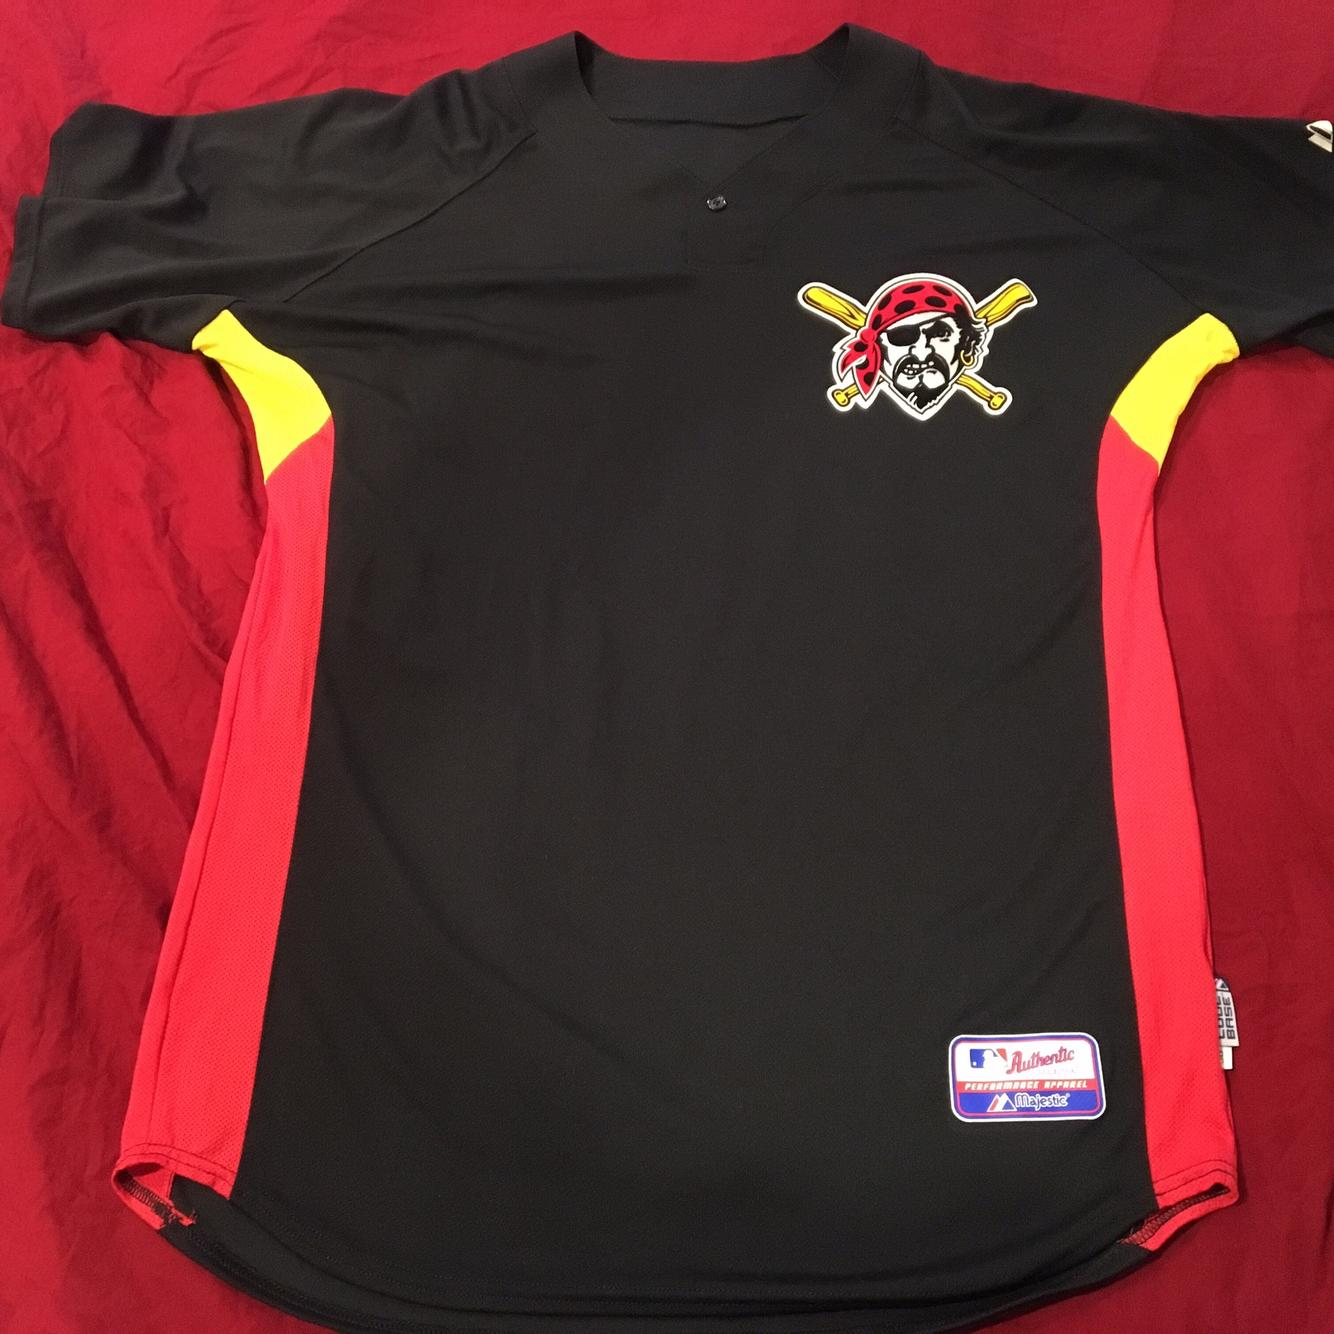 size 50 jersey